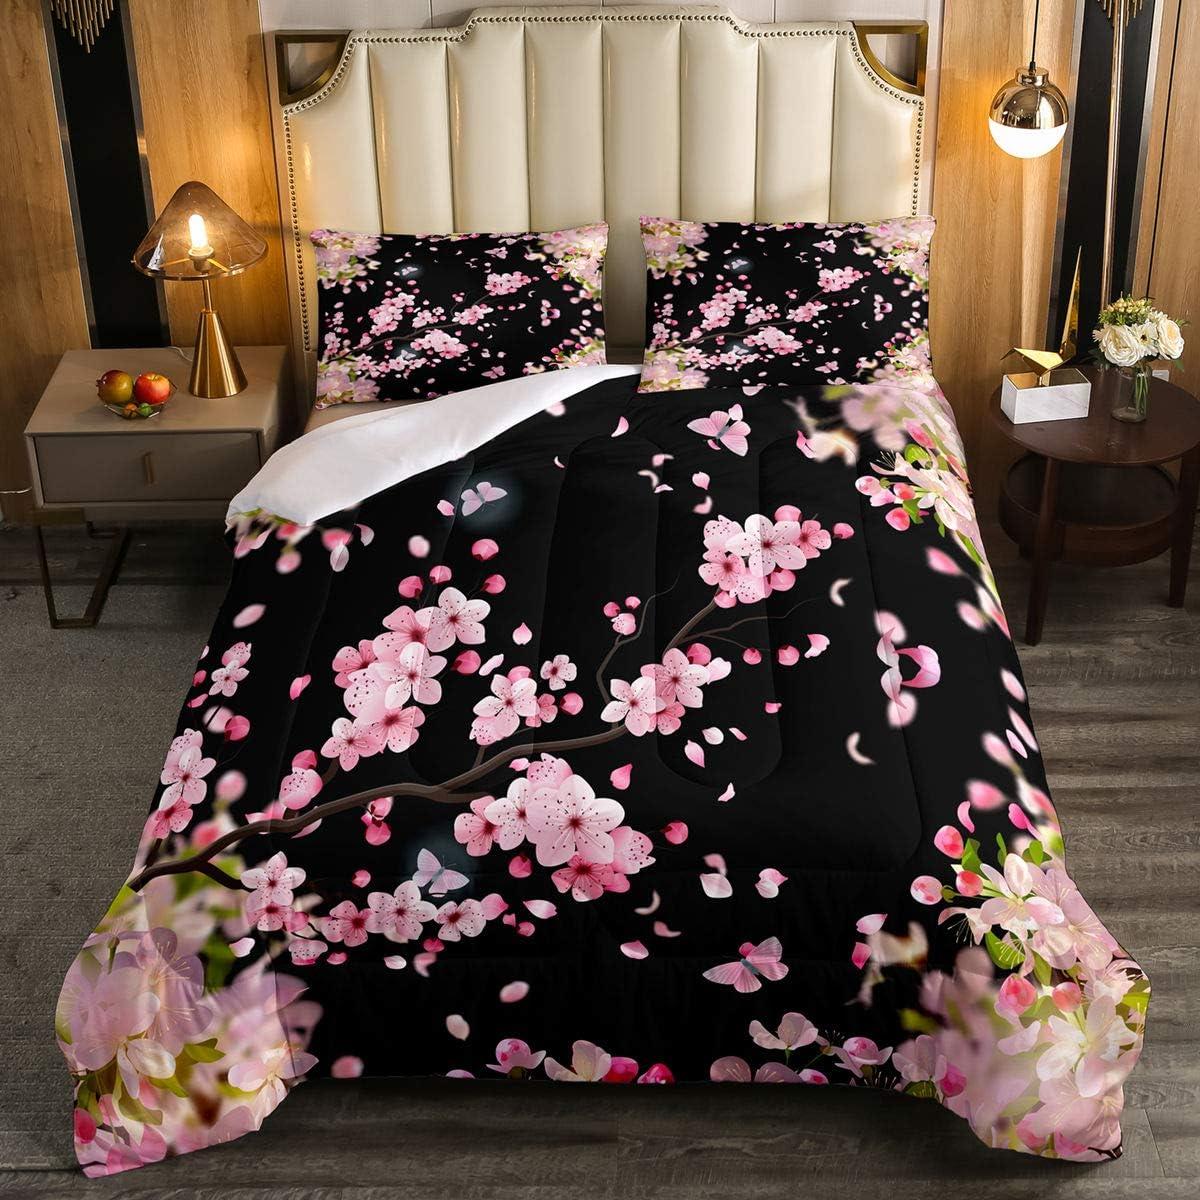 Cherry Blossoms Bedding Comforter Set,Japanese Style Duvet Insert Girls Woman Nature Plant Flower Floral Down Alternative,Decor 2Pcs Bedding Set